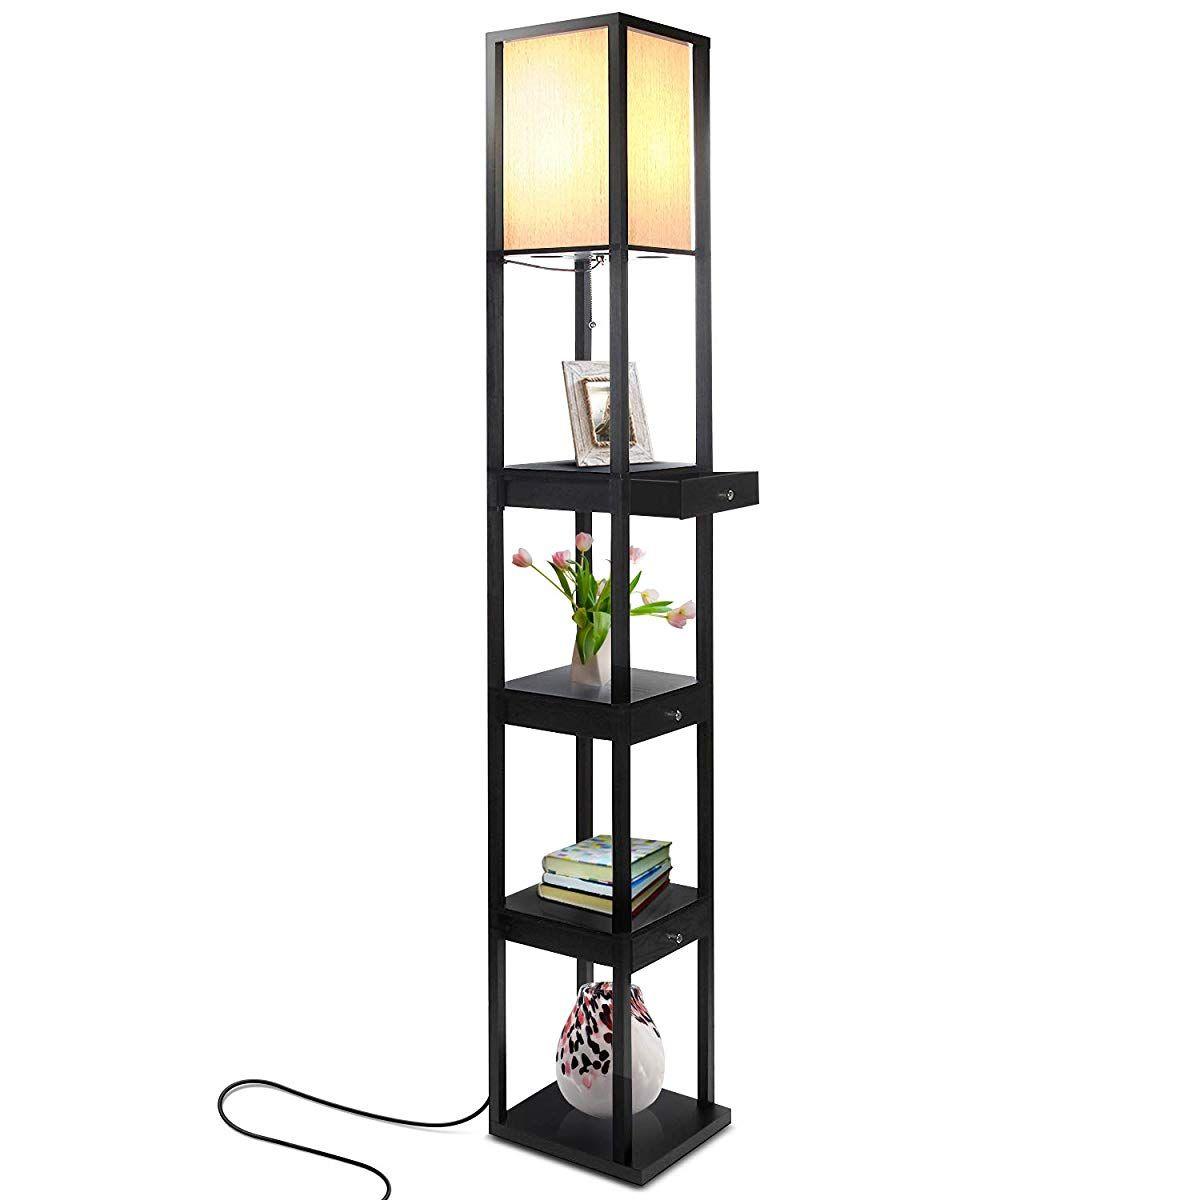 Shelf & LED Floor Lamp Combination Cool floor lamps